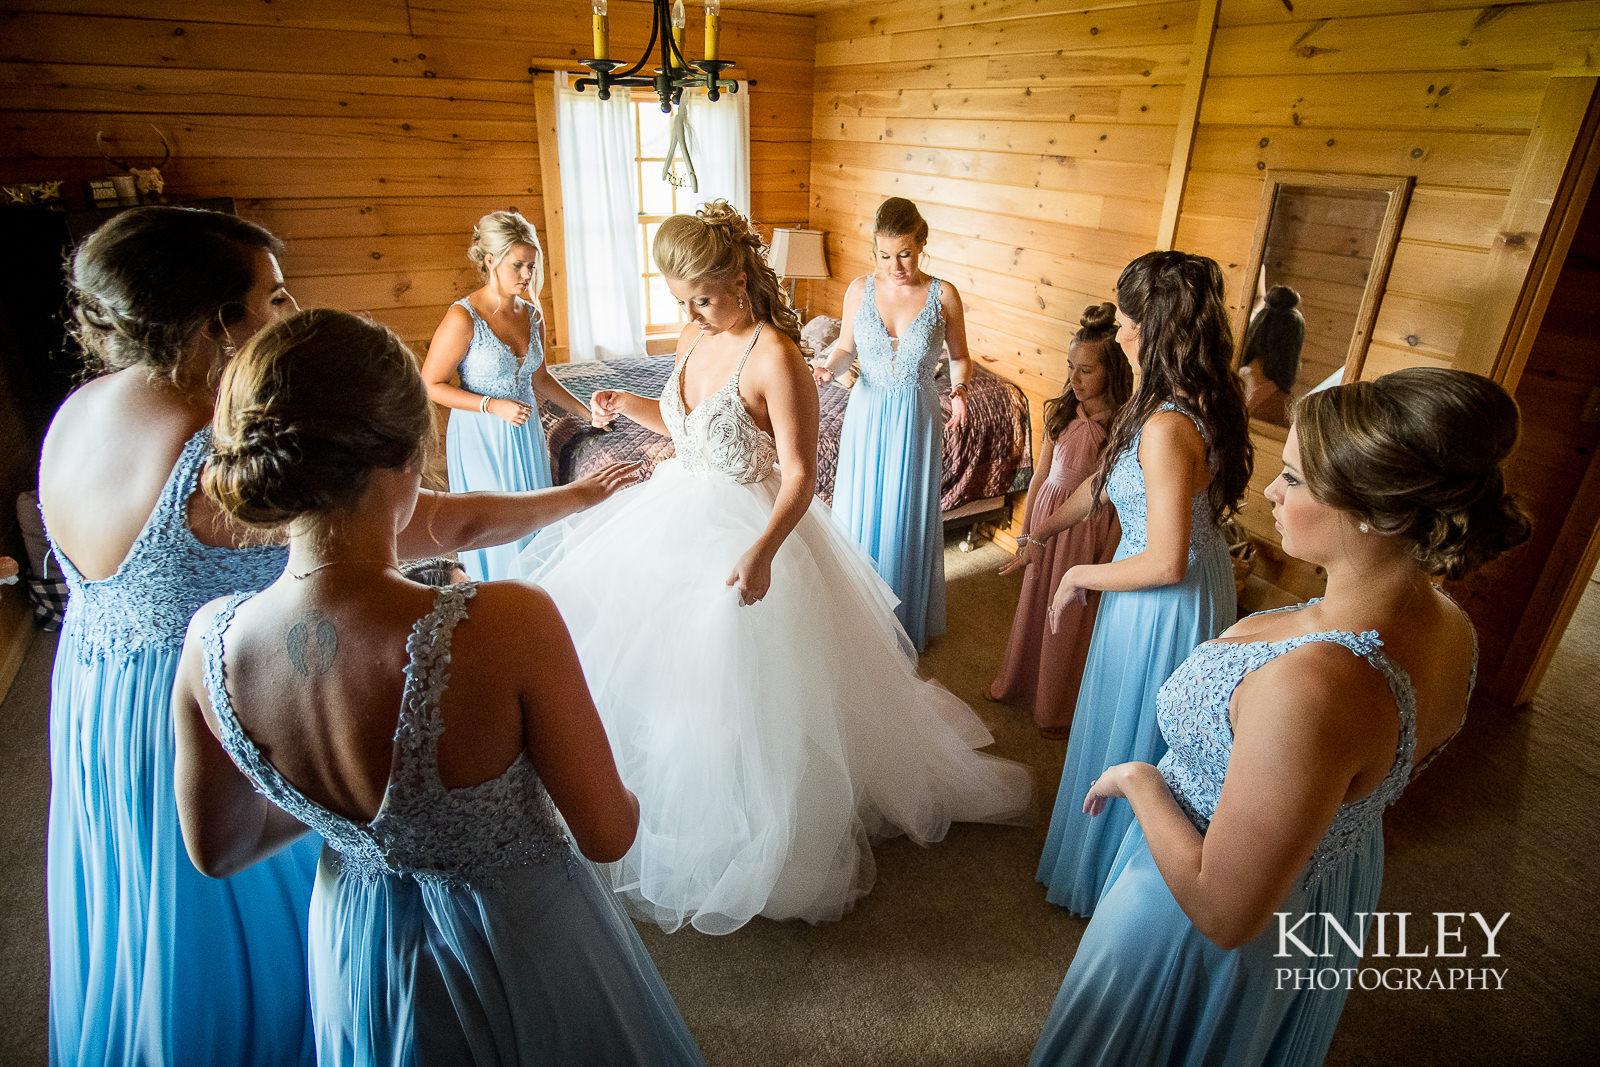 029 - Buffalo NY wedding - Preparation pictures - XT2B8369.jpg